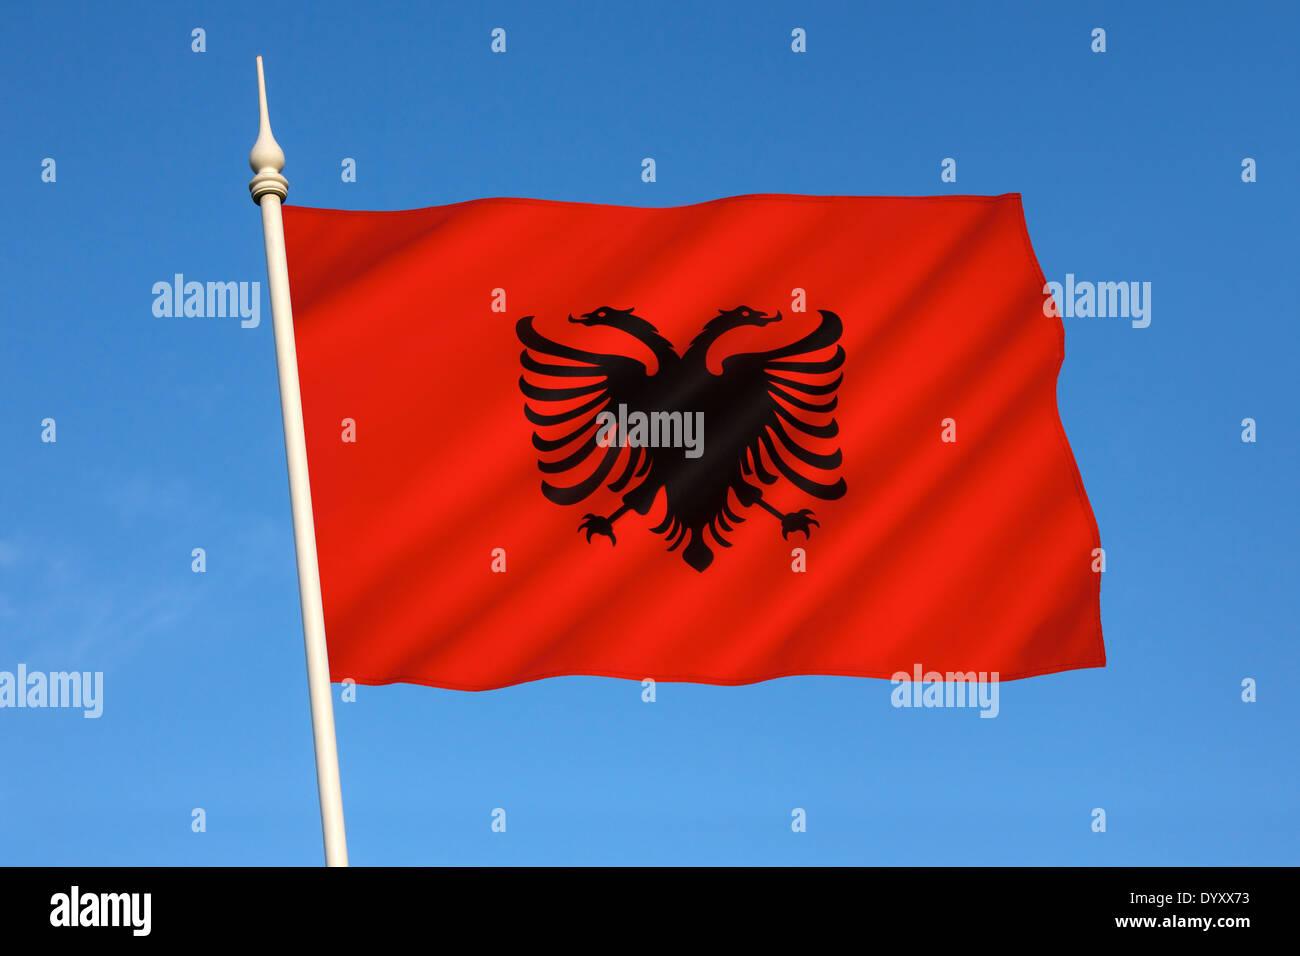 The Flag of Albania - Stock Image